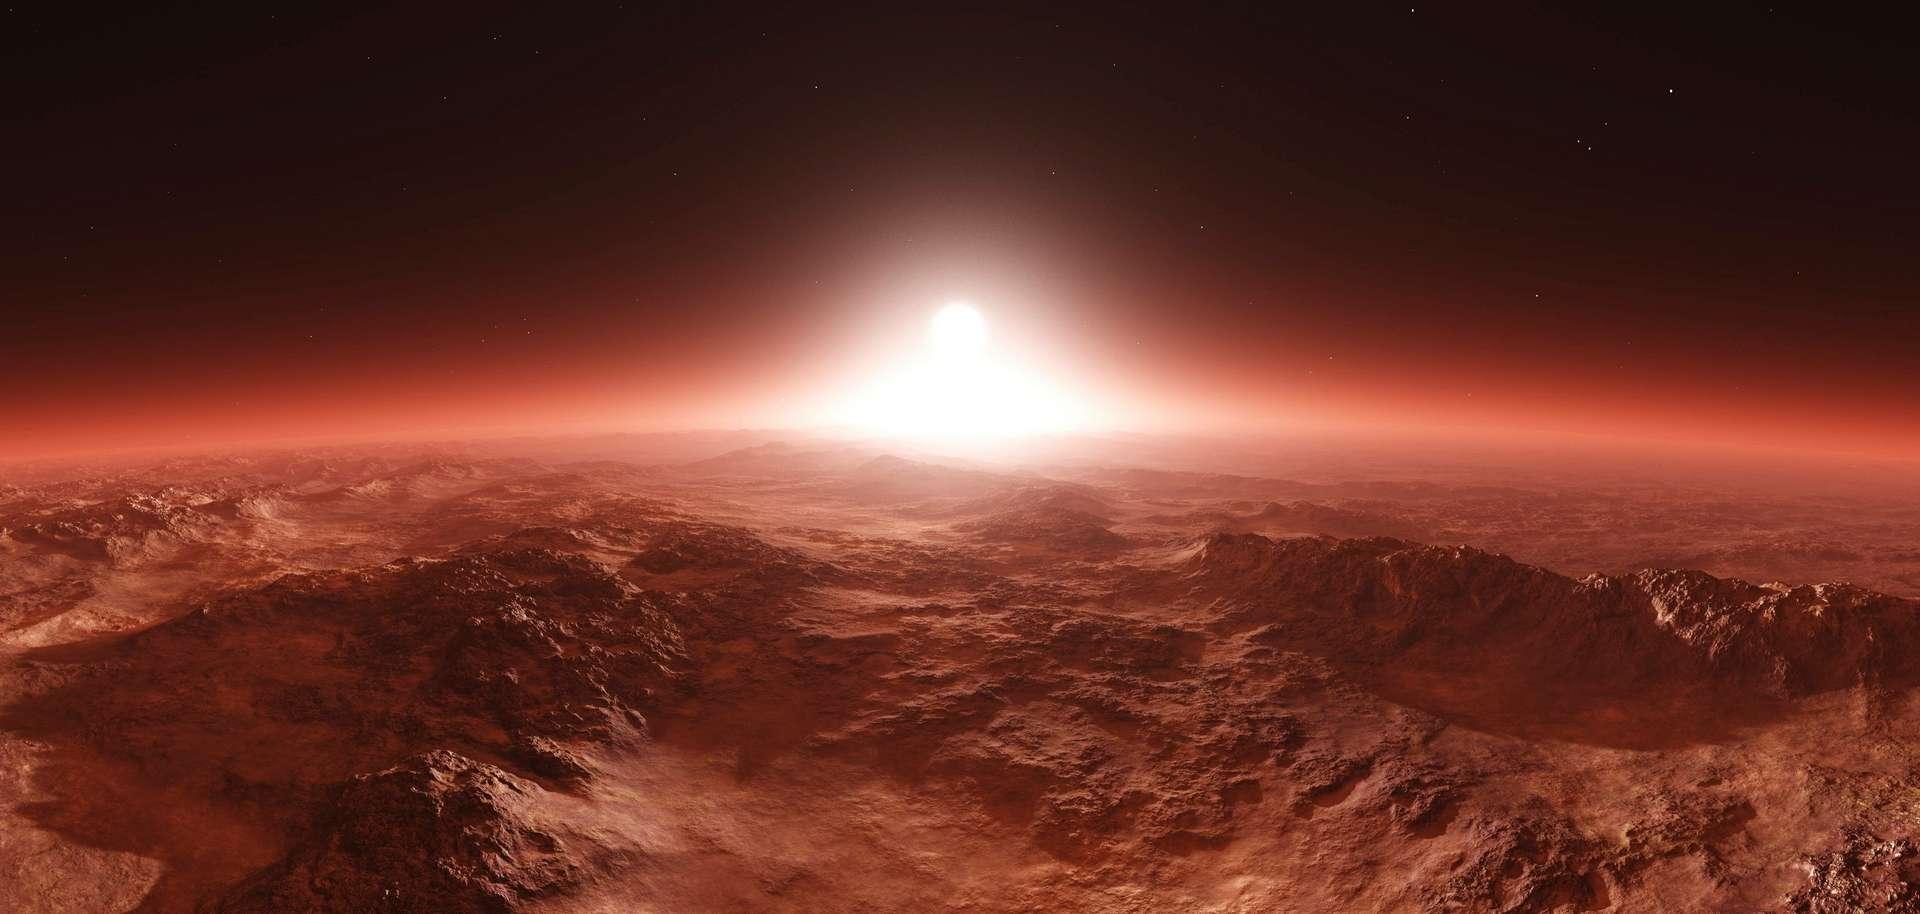 Vue d'artiste de Mars. © ustas, Adobe Stock